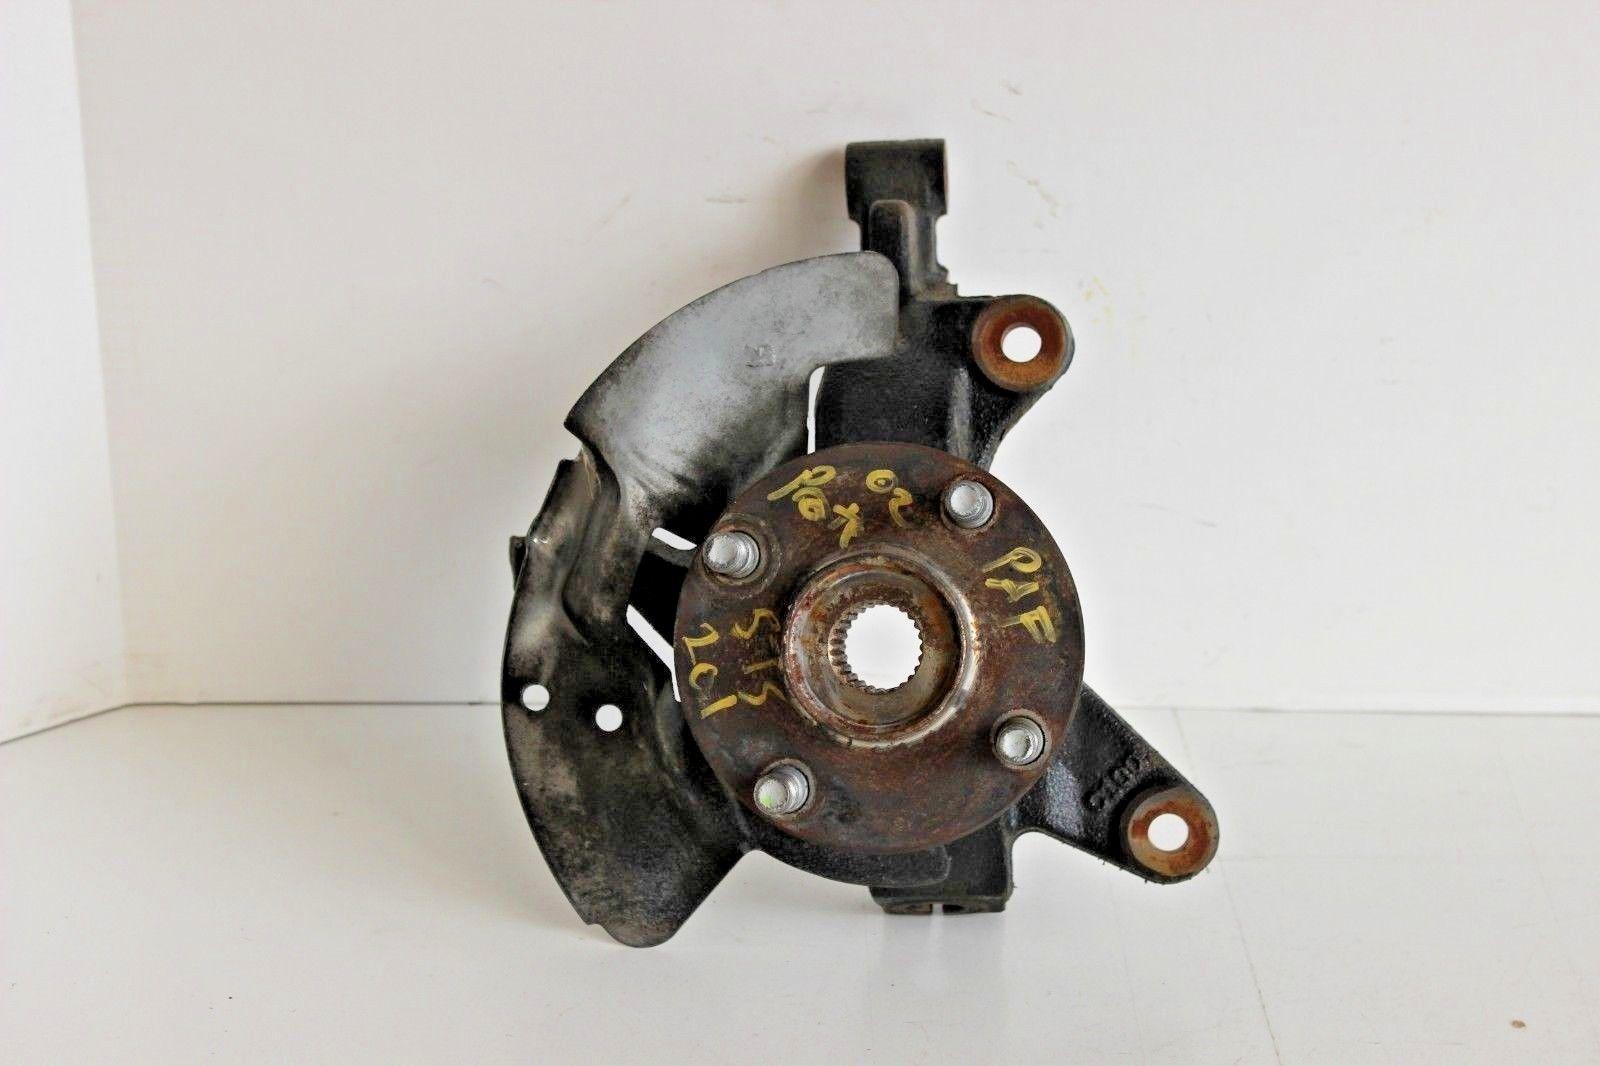 2000 2001 2002 2003 Mazda Protege RH Right Passenger Side Front Spindle Hub  Steering Knuckle Assembly